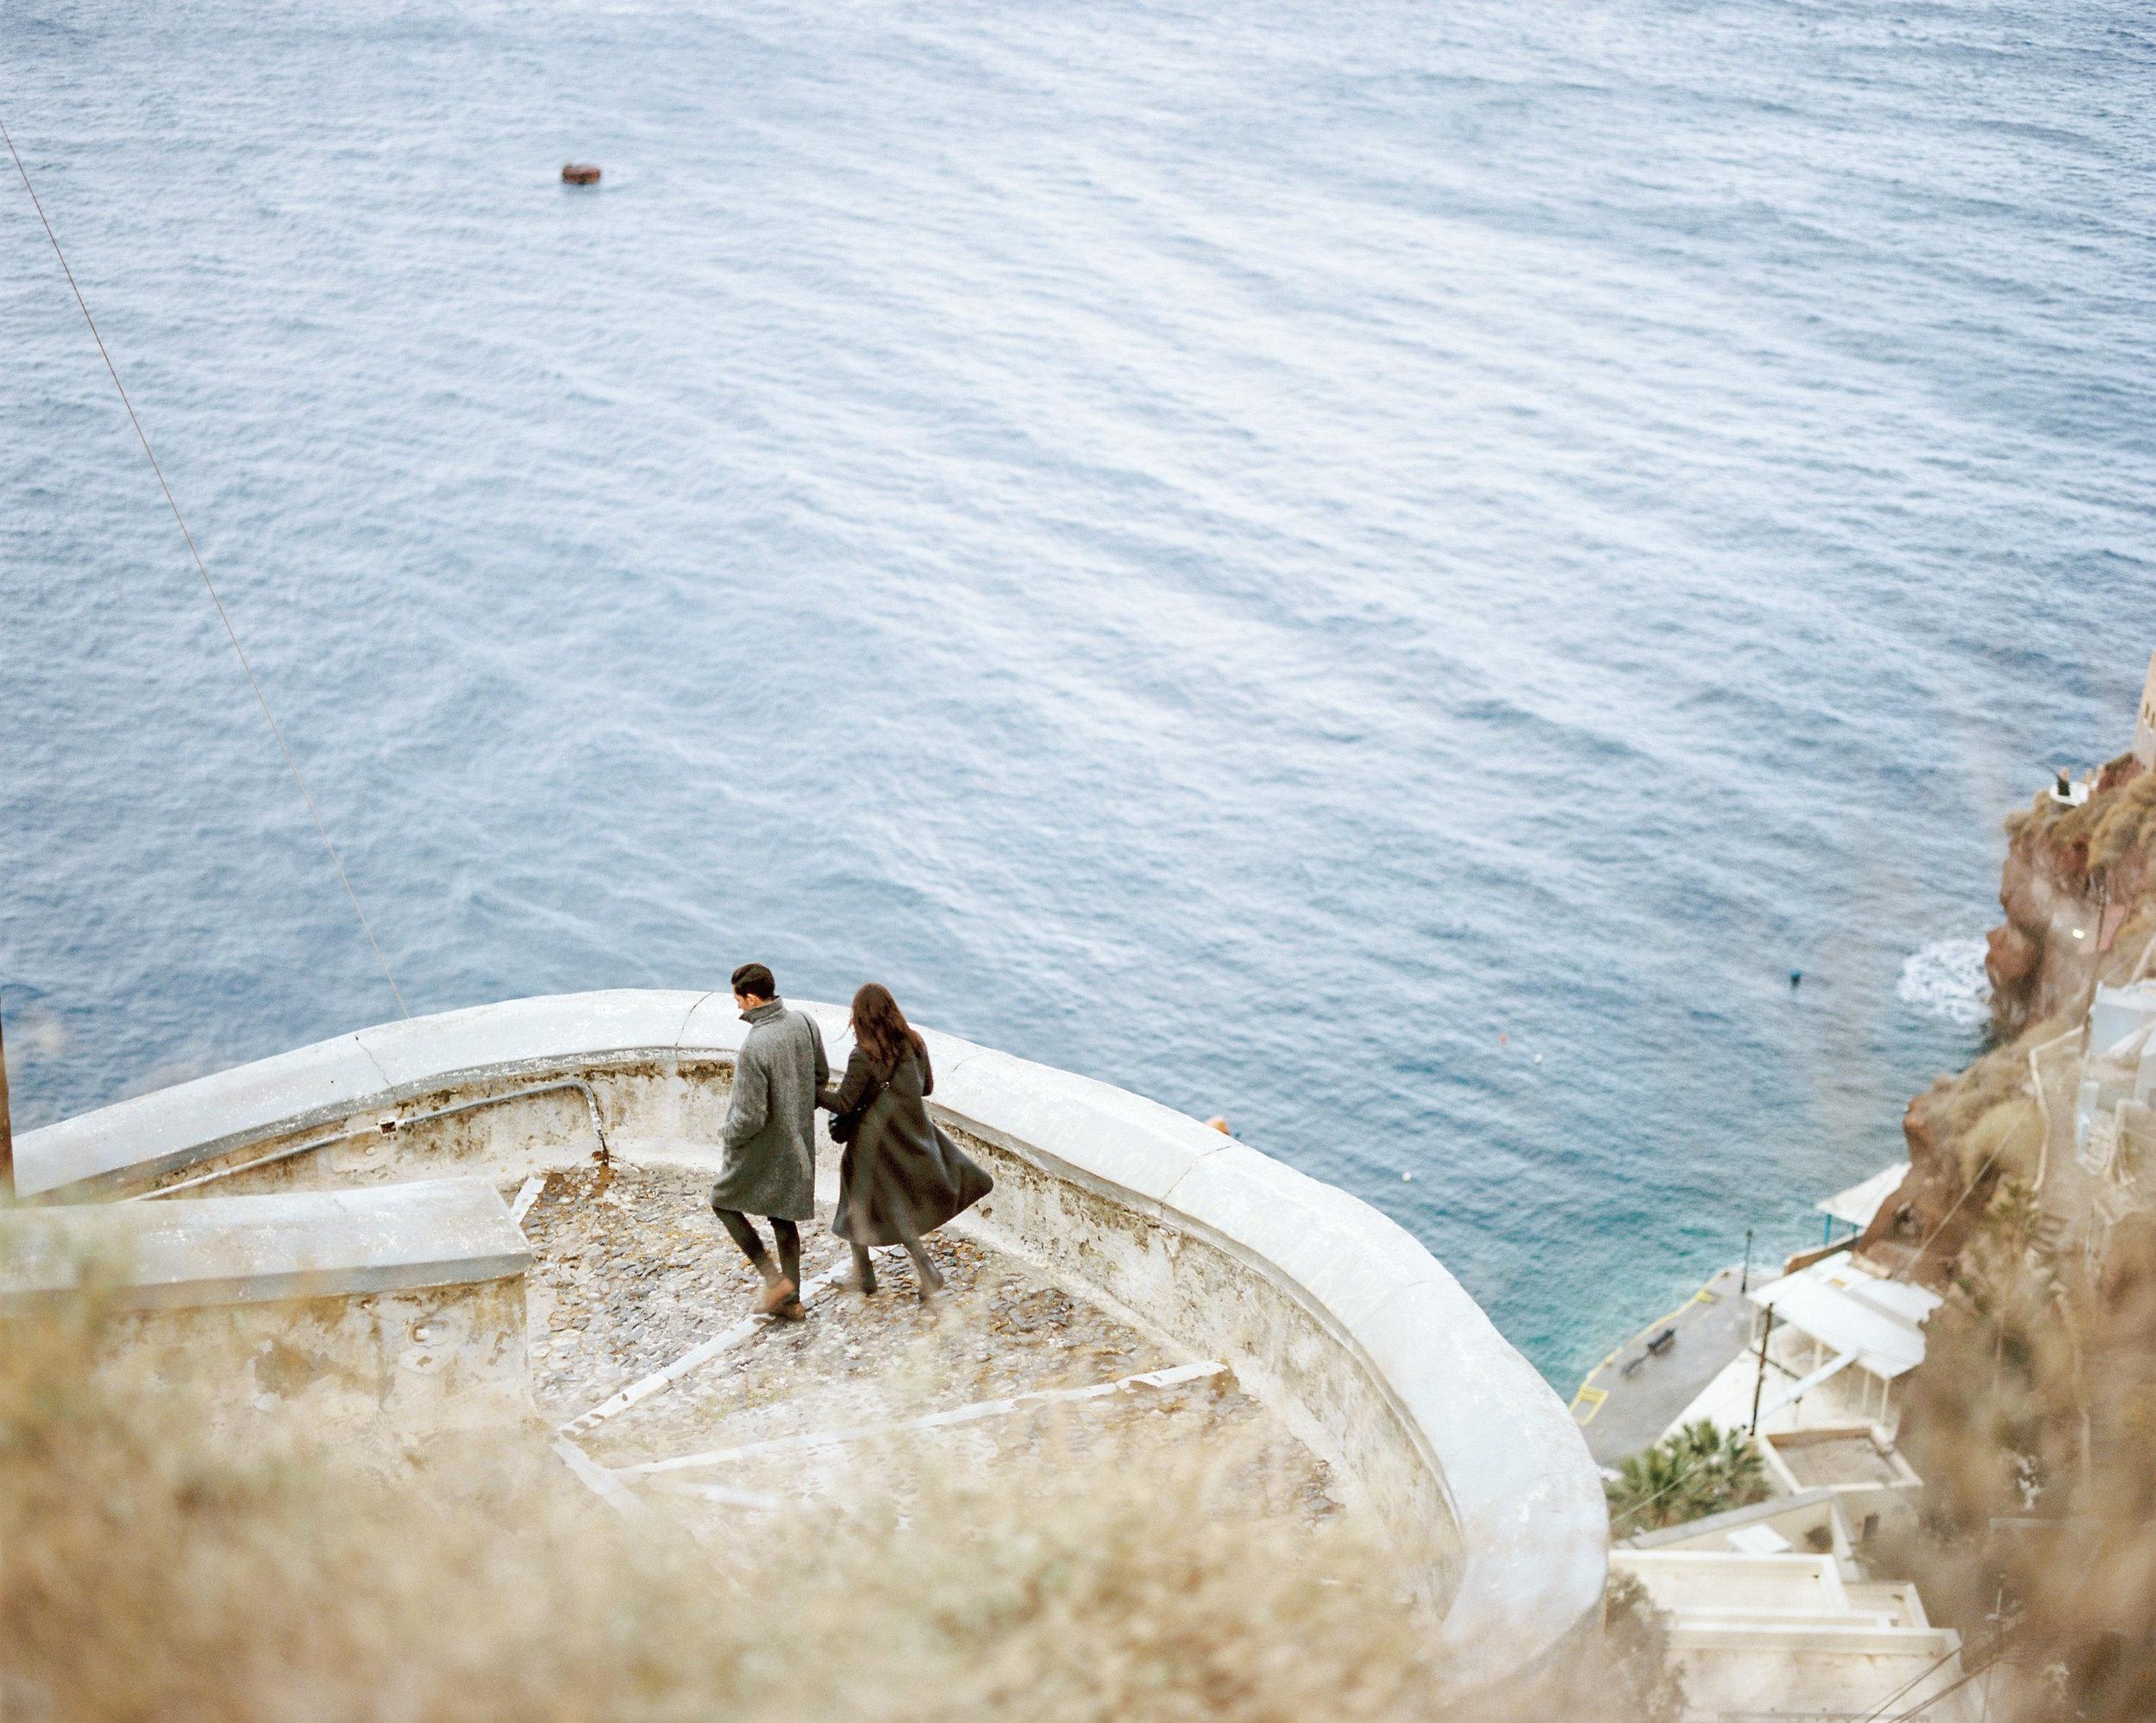 celinehamelin-photographe-couple-argentique-loversession-grece-santorin-argentique-filmphotography-greece4.jpg